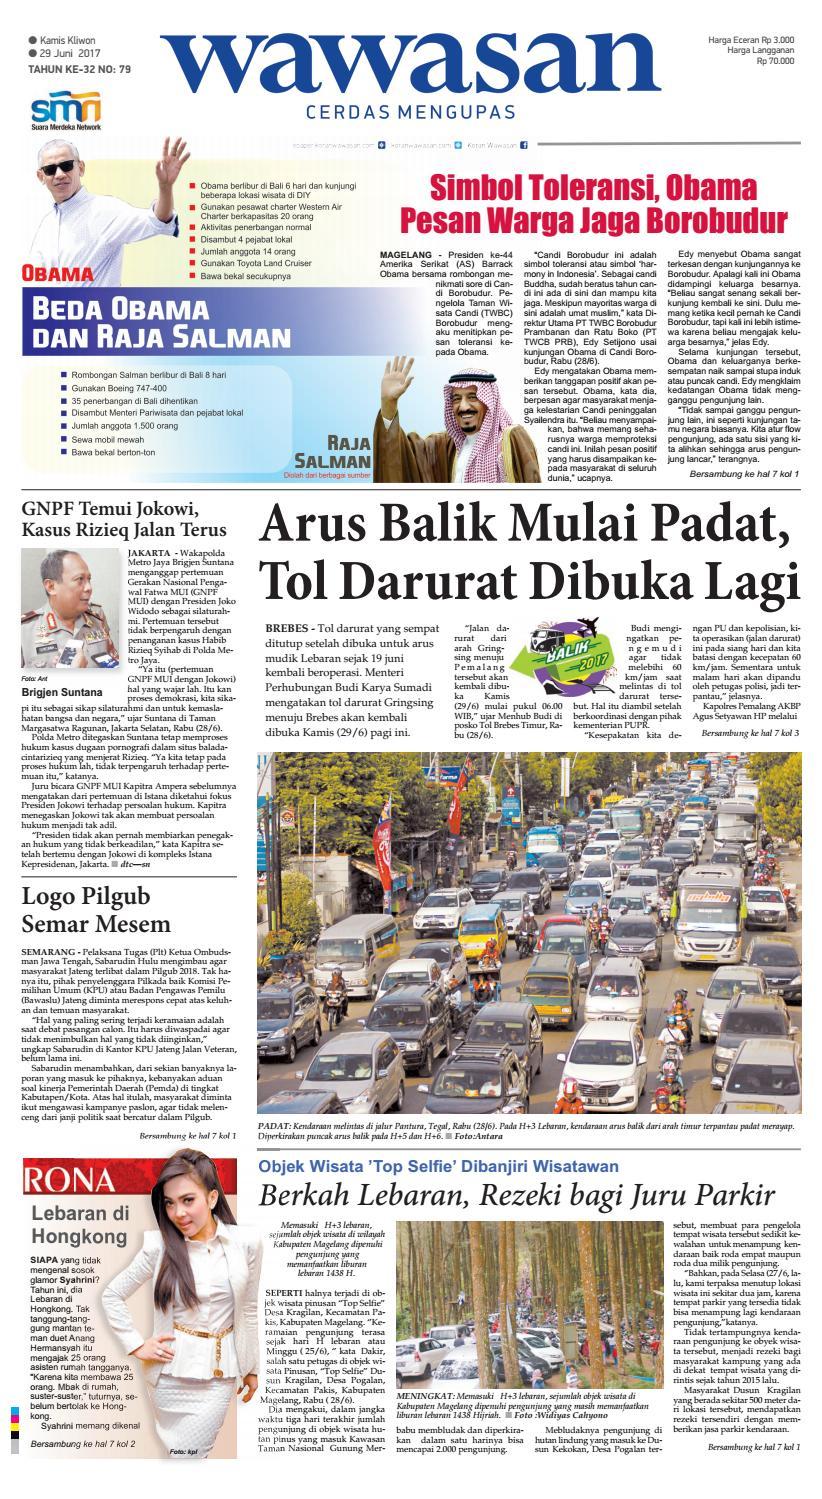 Contoh Pawarta Bahasa Jawa Beserta 5w1h 2018 - Bagikan Contoh